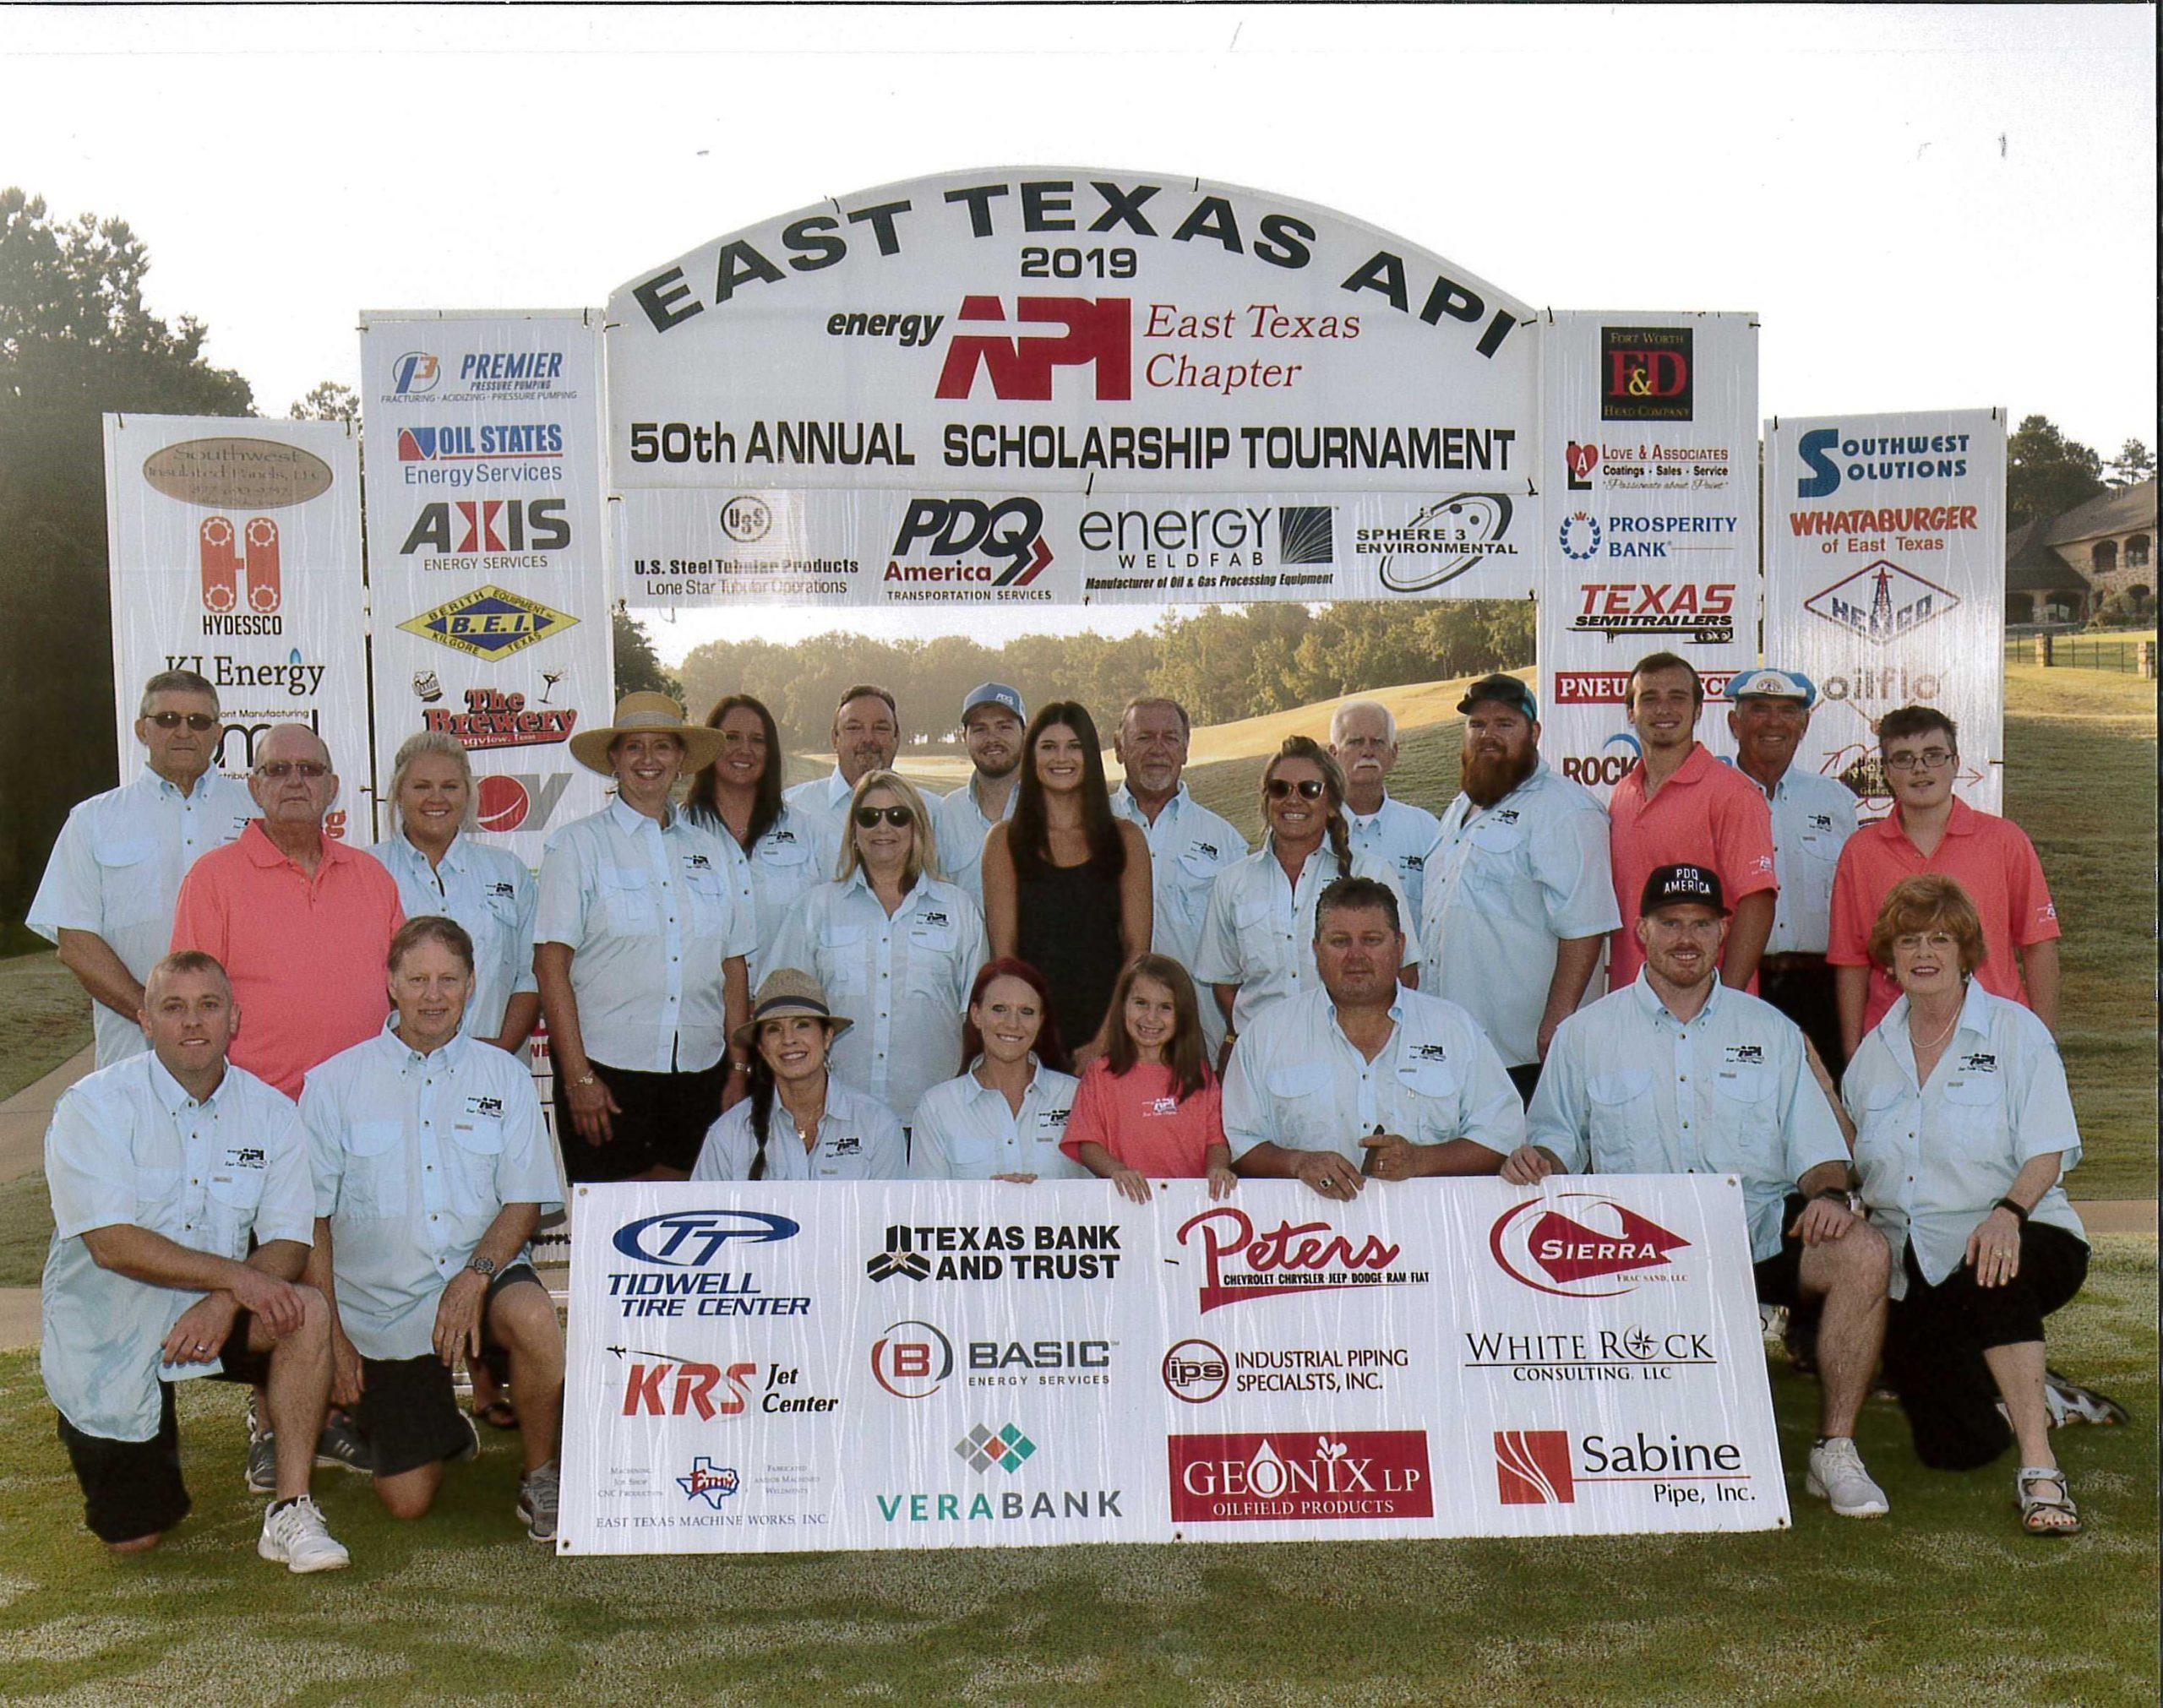 52nd Annual East Texas API Golf Tournament at Tempest Golf Club